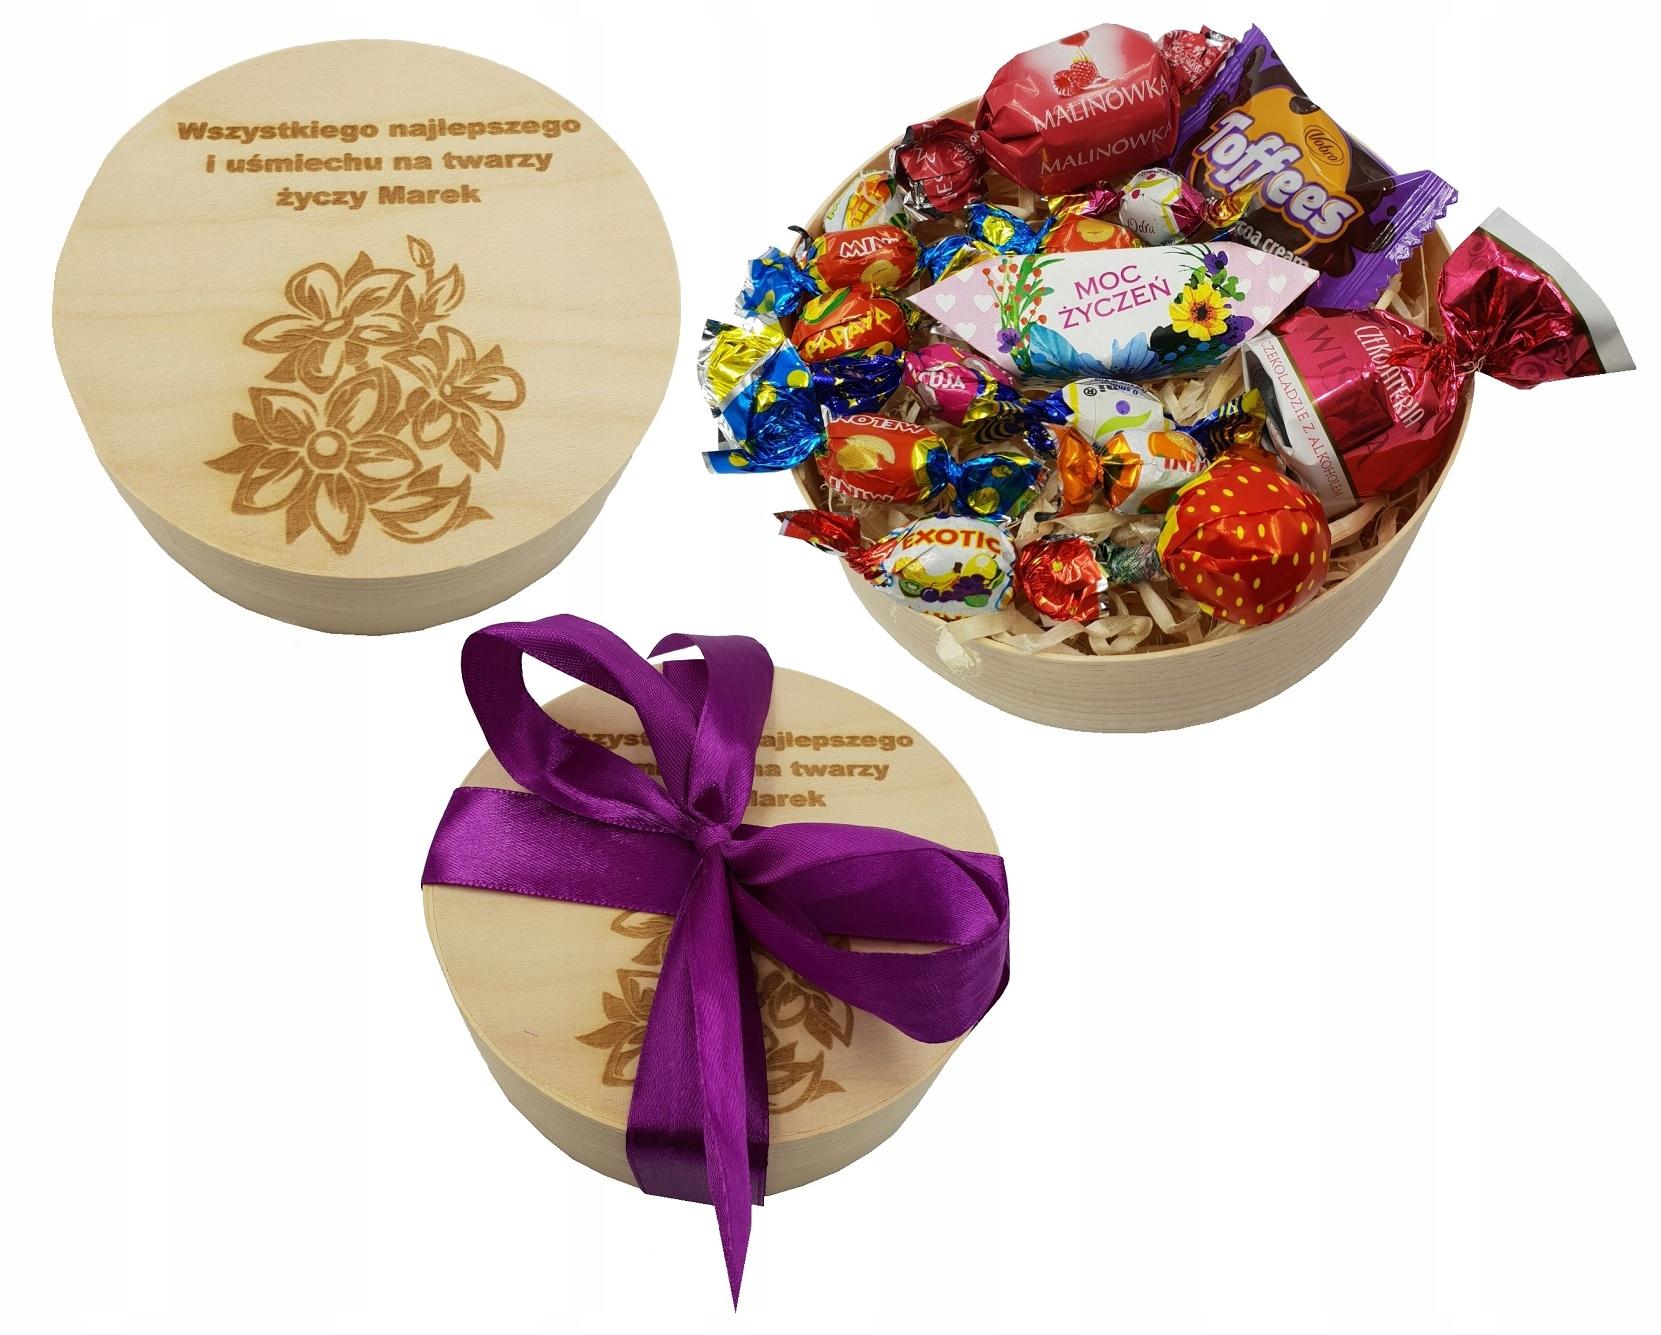 Item Box Engraver's day Gift we women Granny